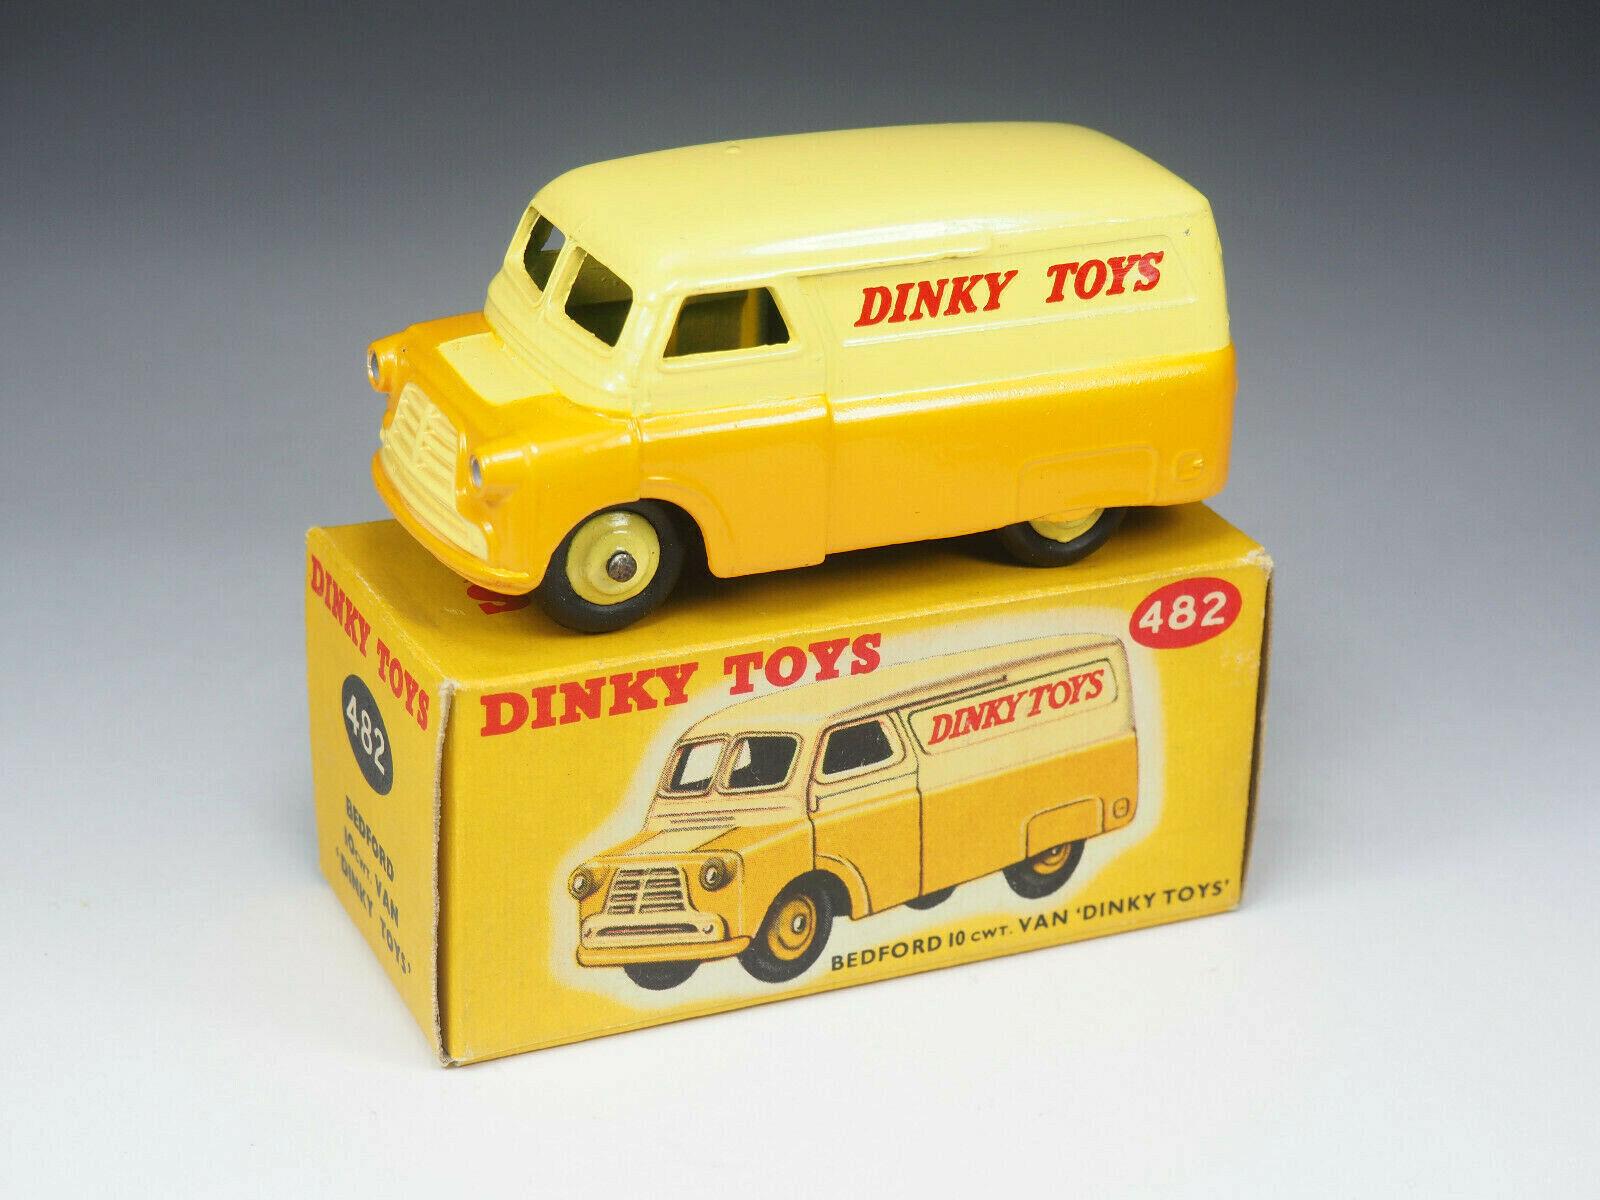 DINKY SpielzeugS - 482 - Bedford  Dinky Spielzeugs  Van - 1 43e